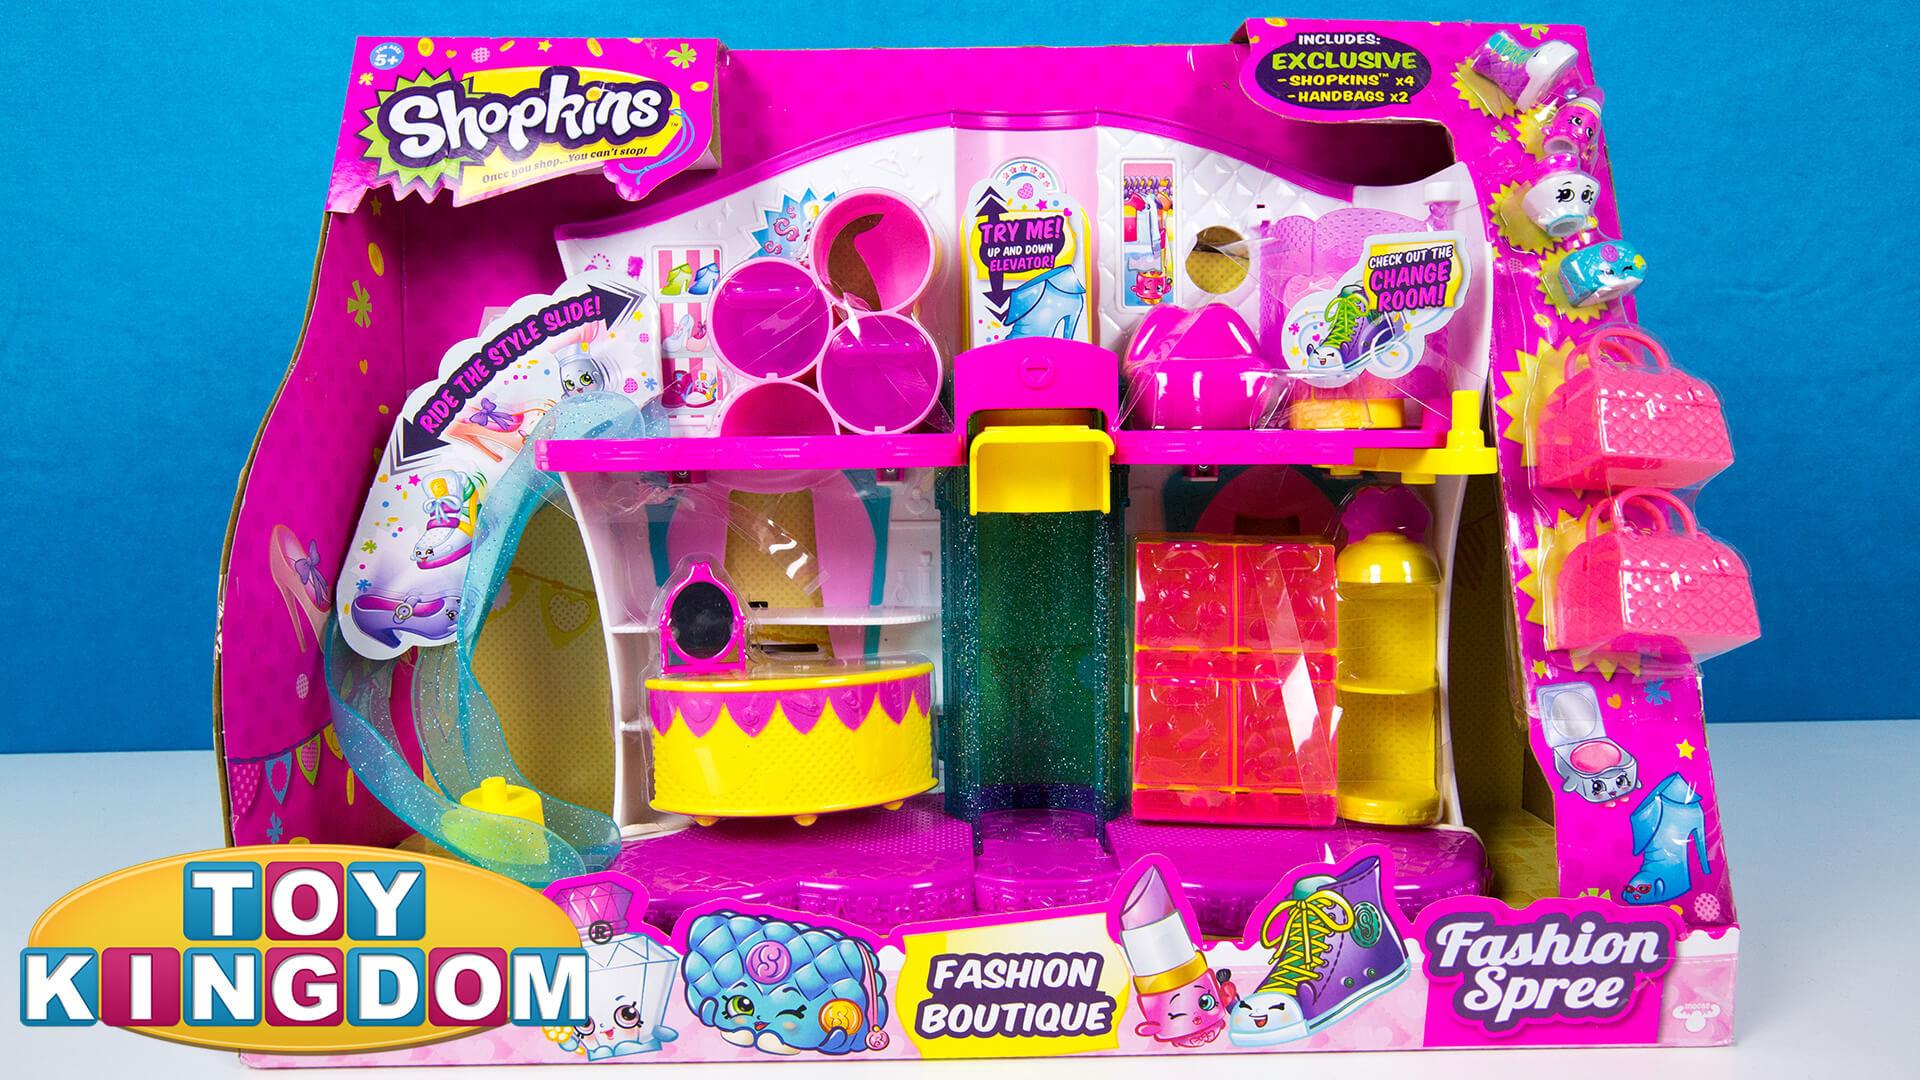 Shopkins Fashion Boutique Playset Review